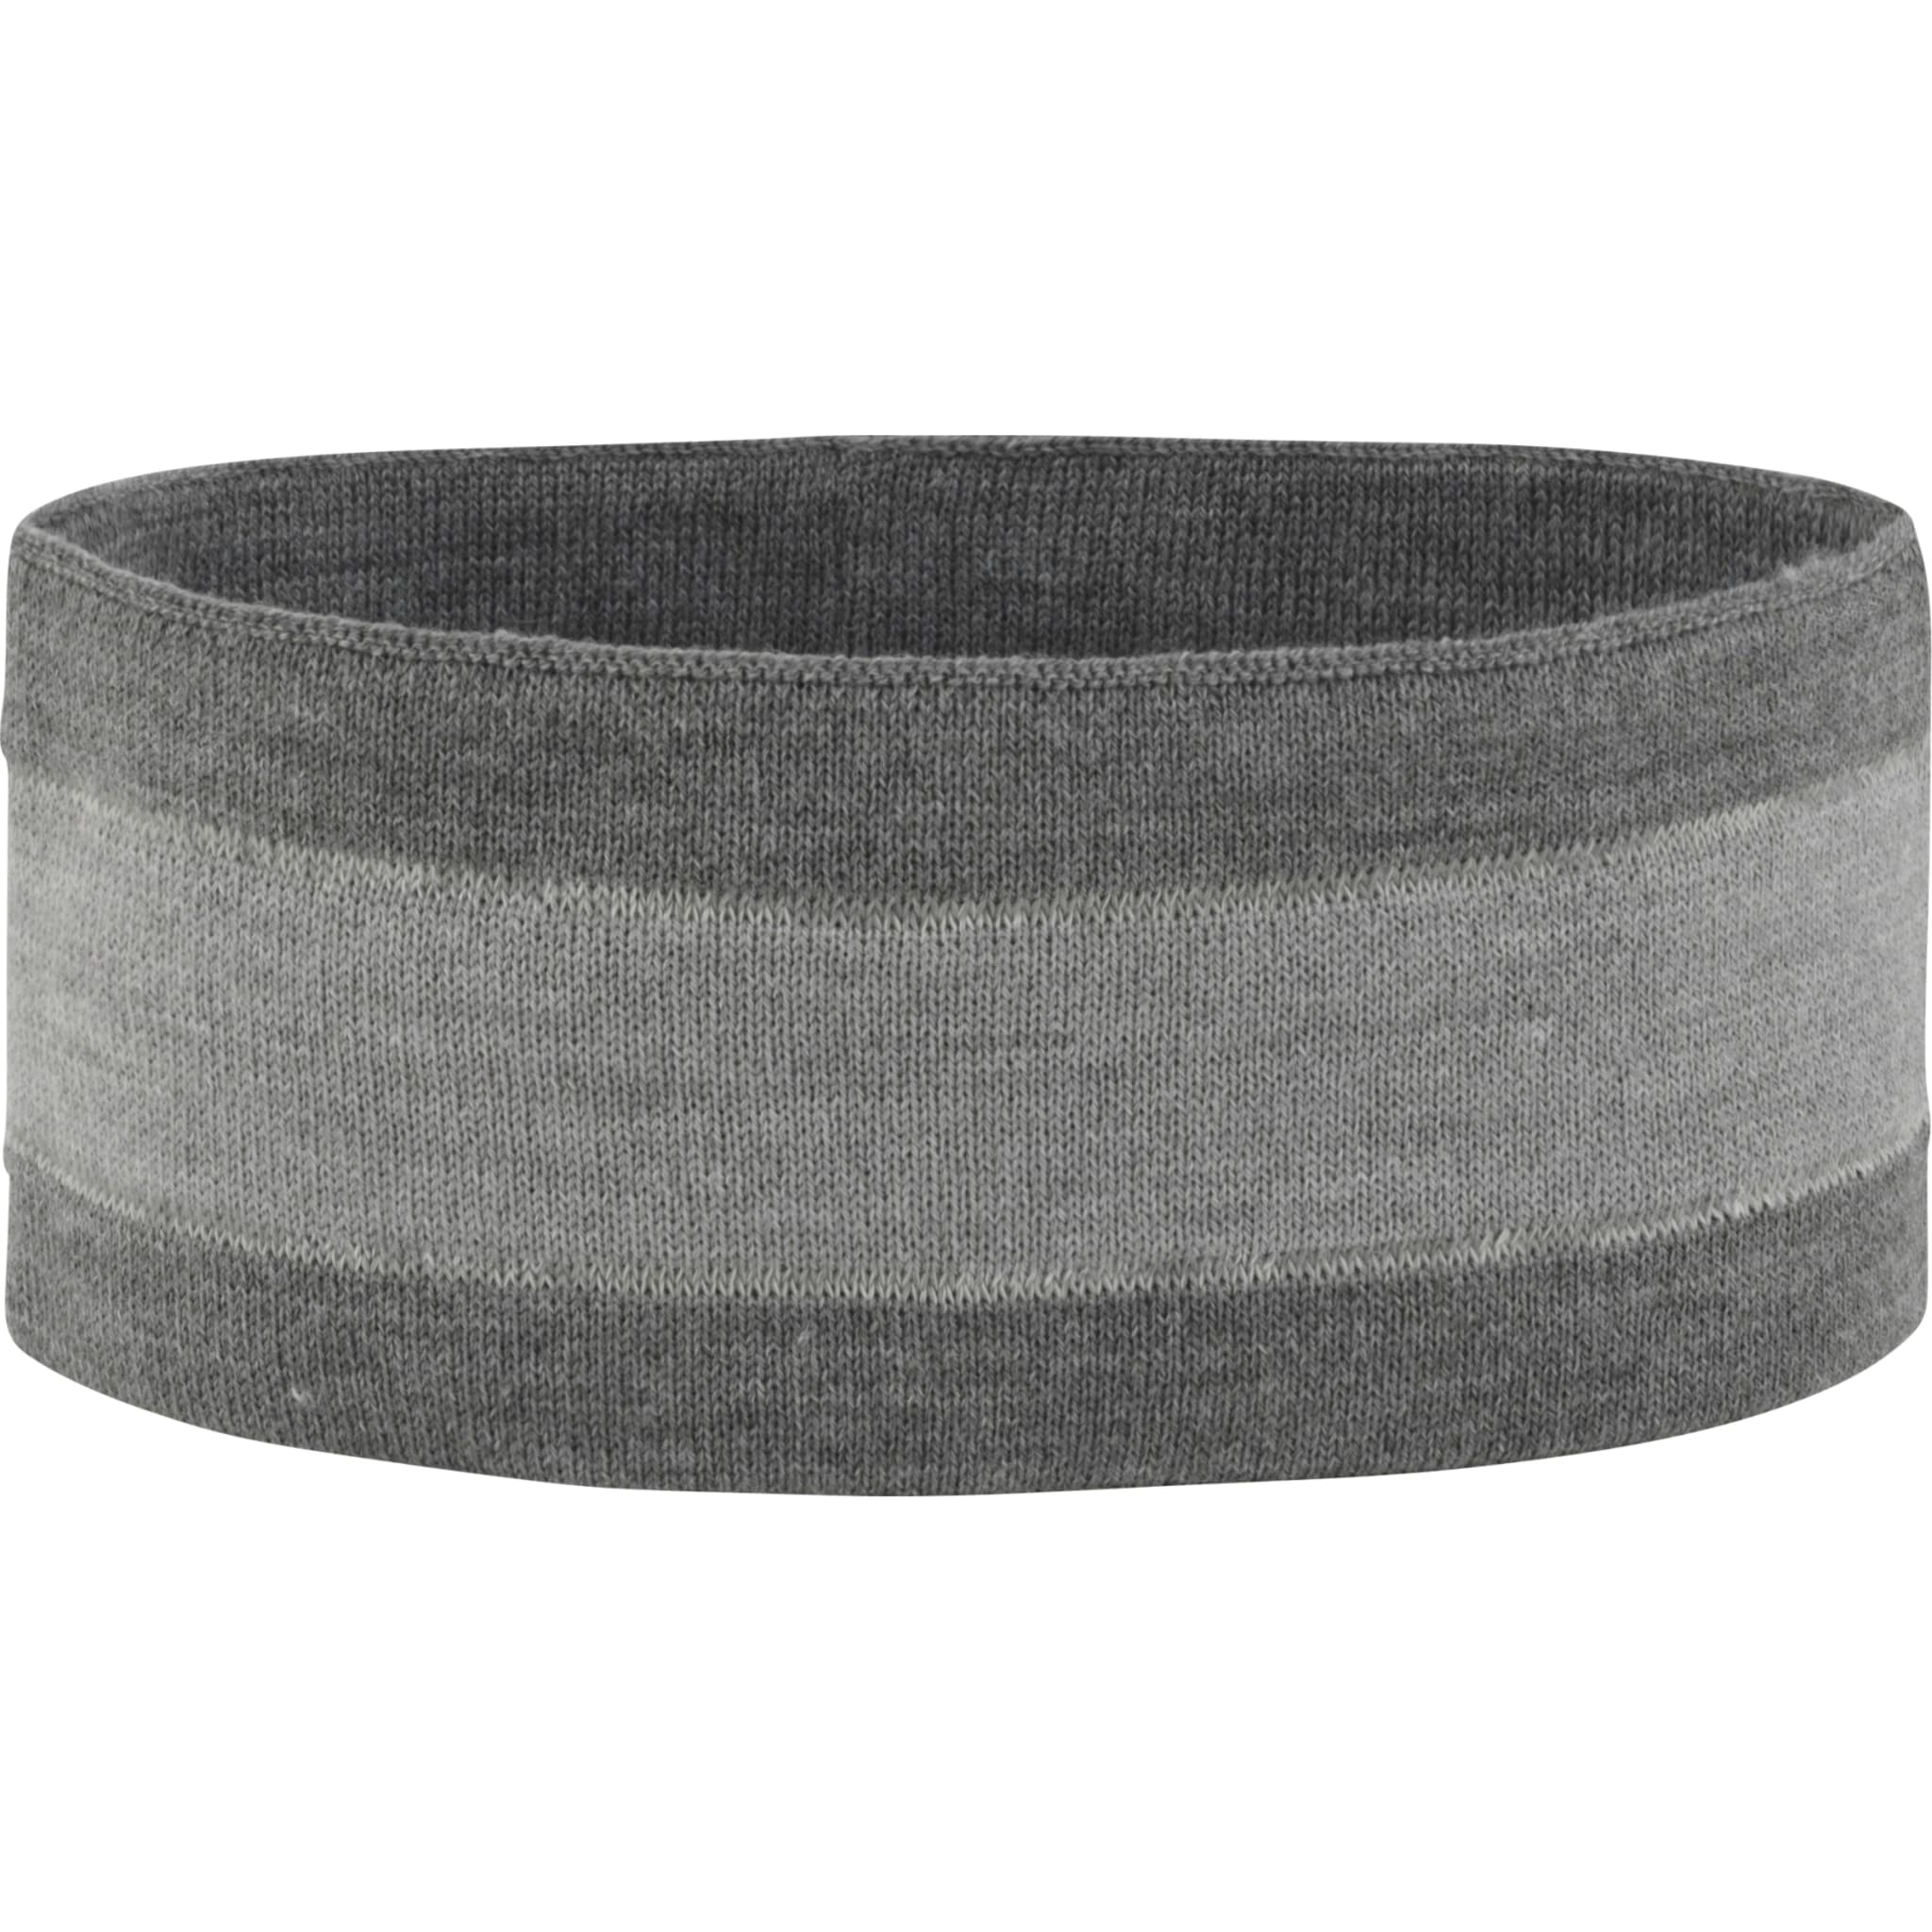 Stripe Refleks Pannebånd